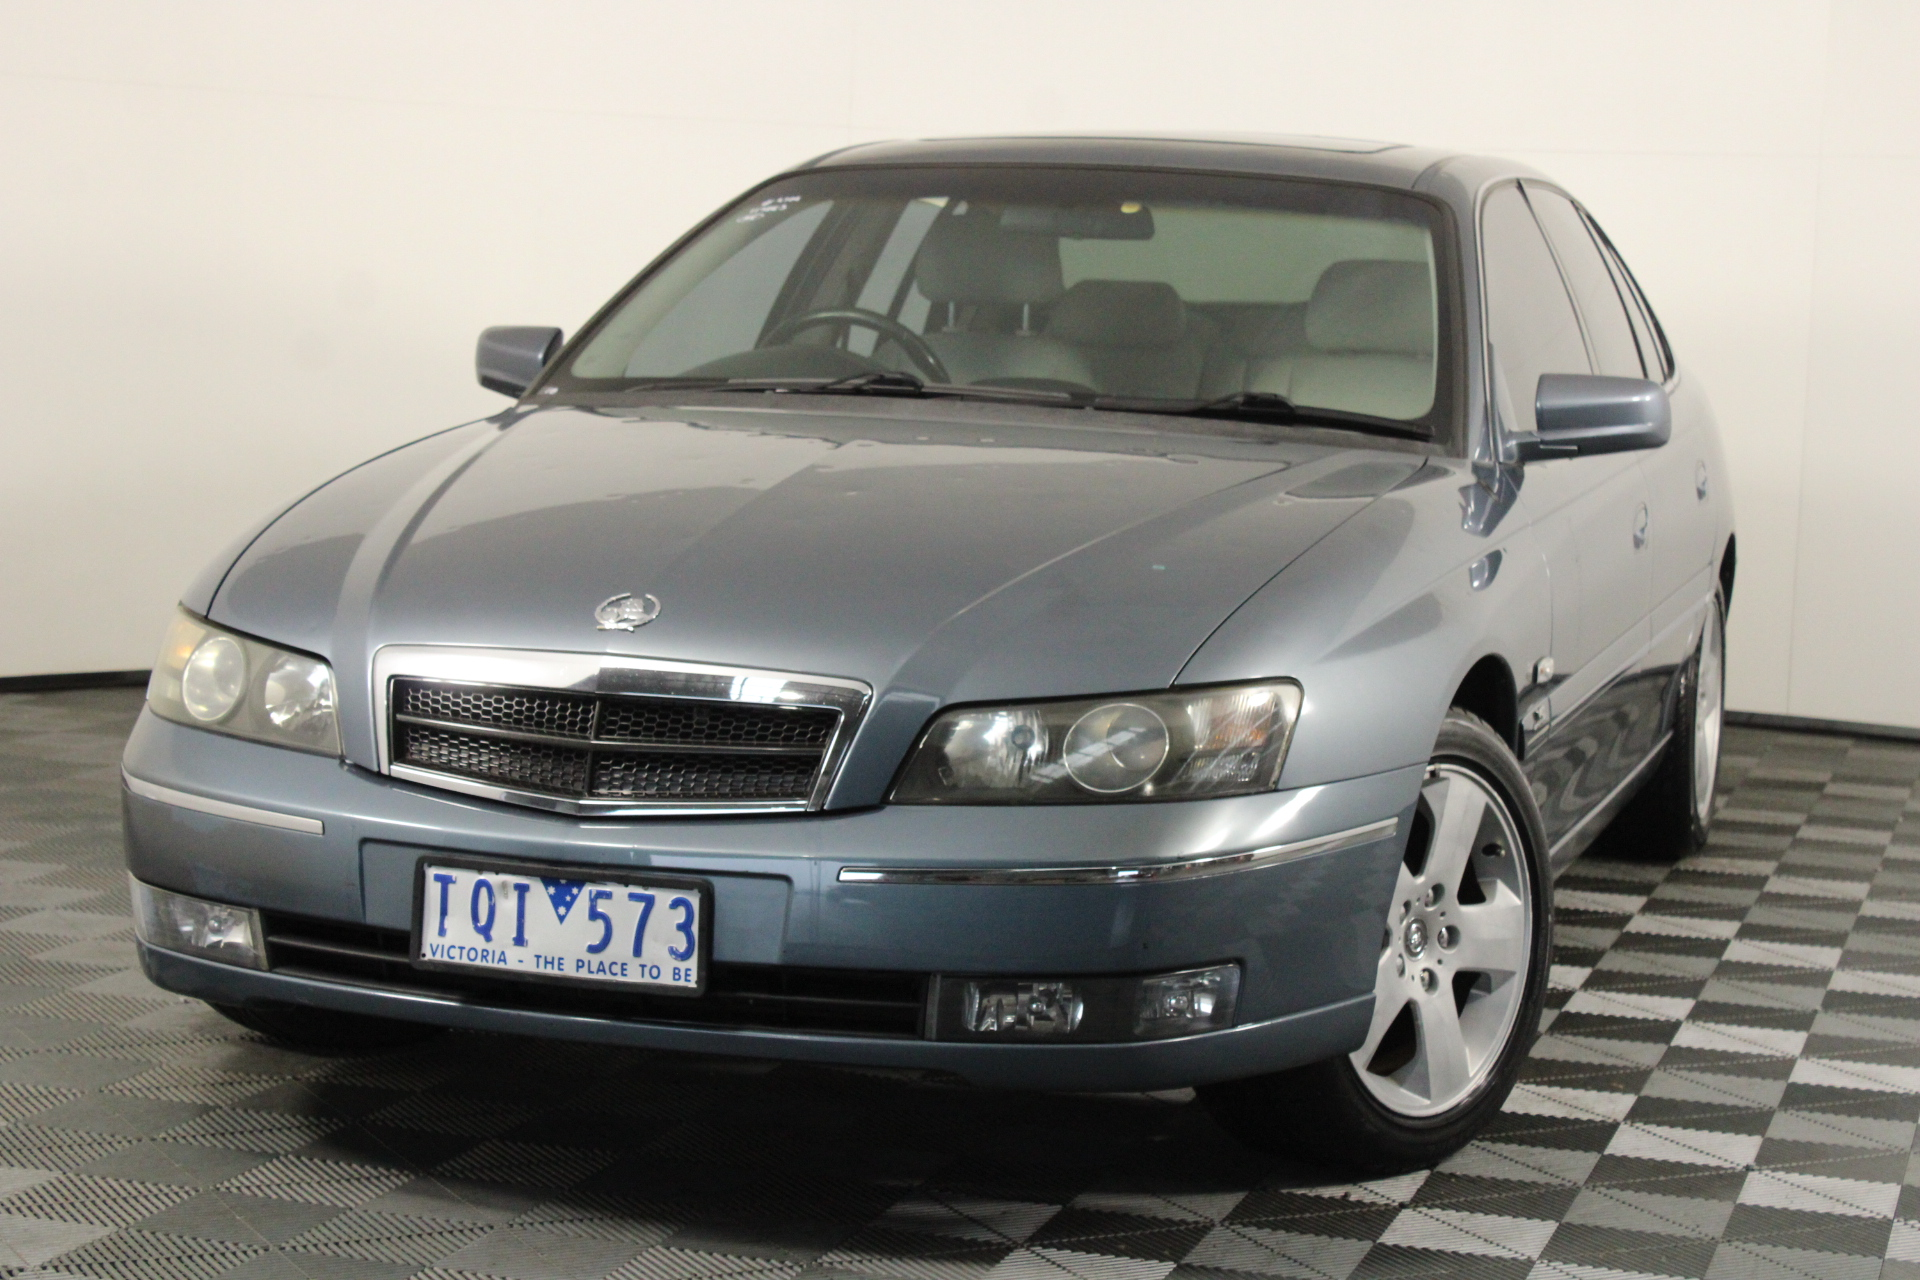 2005 Holden Statesman International WL Auto Sedan (WOVR Inspected)